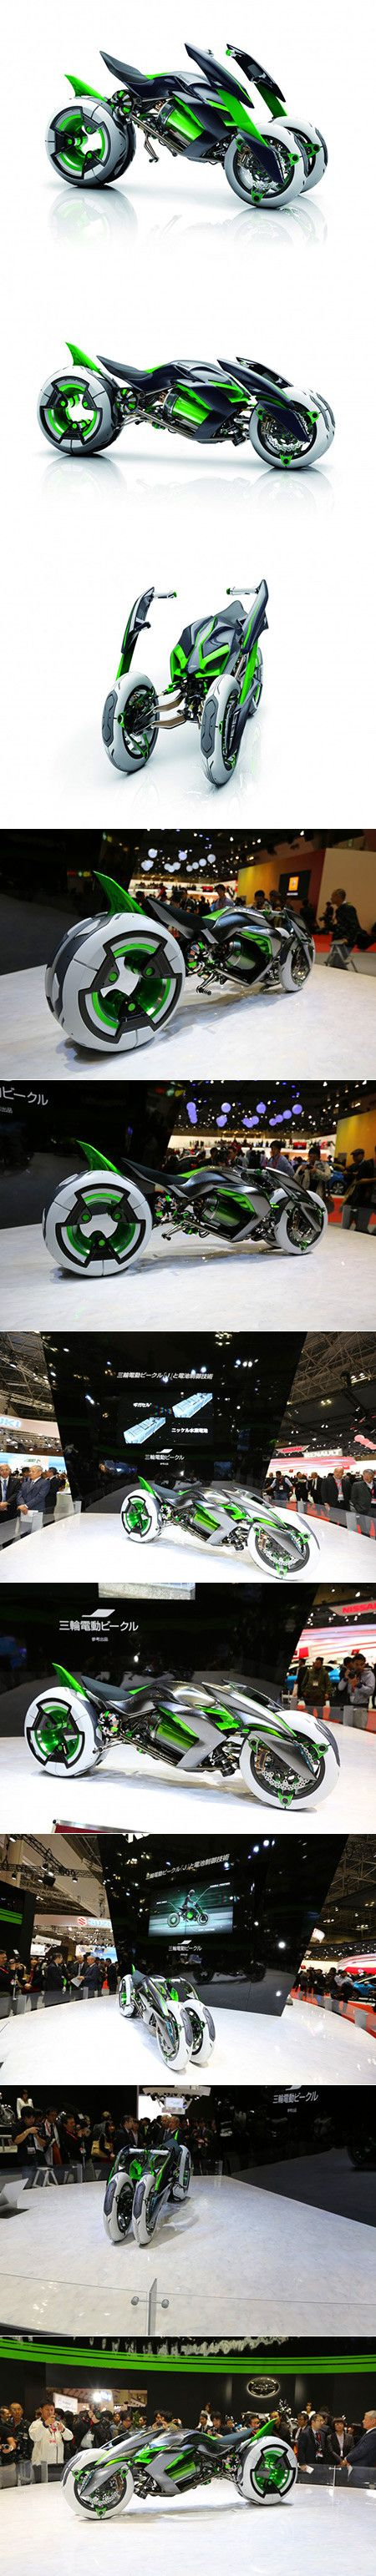 Kawasaki J is a Real-Life TRON Light Cycle, Features Shape Shifting 3-Wheel Design - TechEBlog